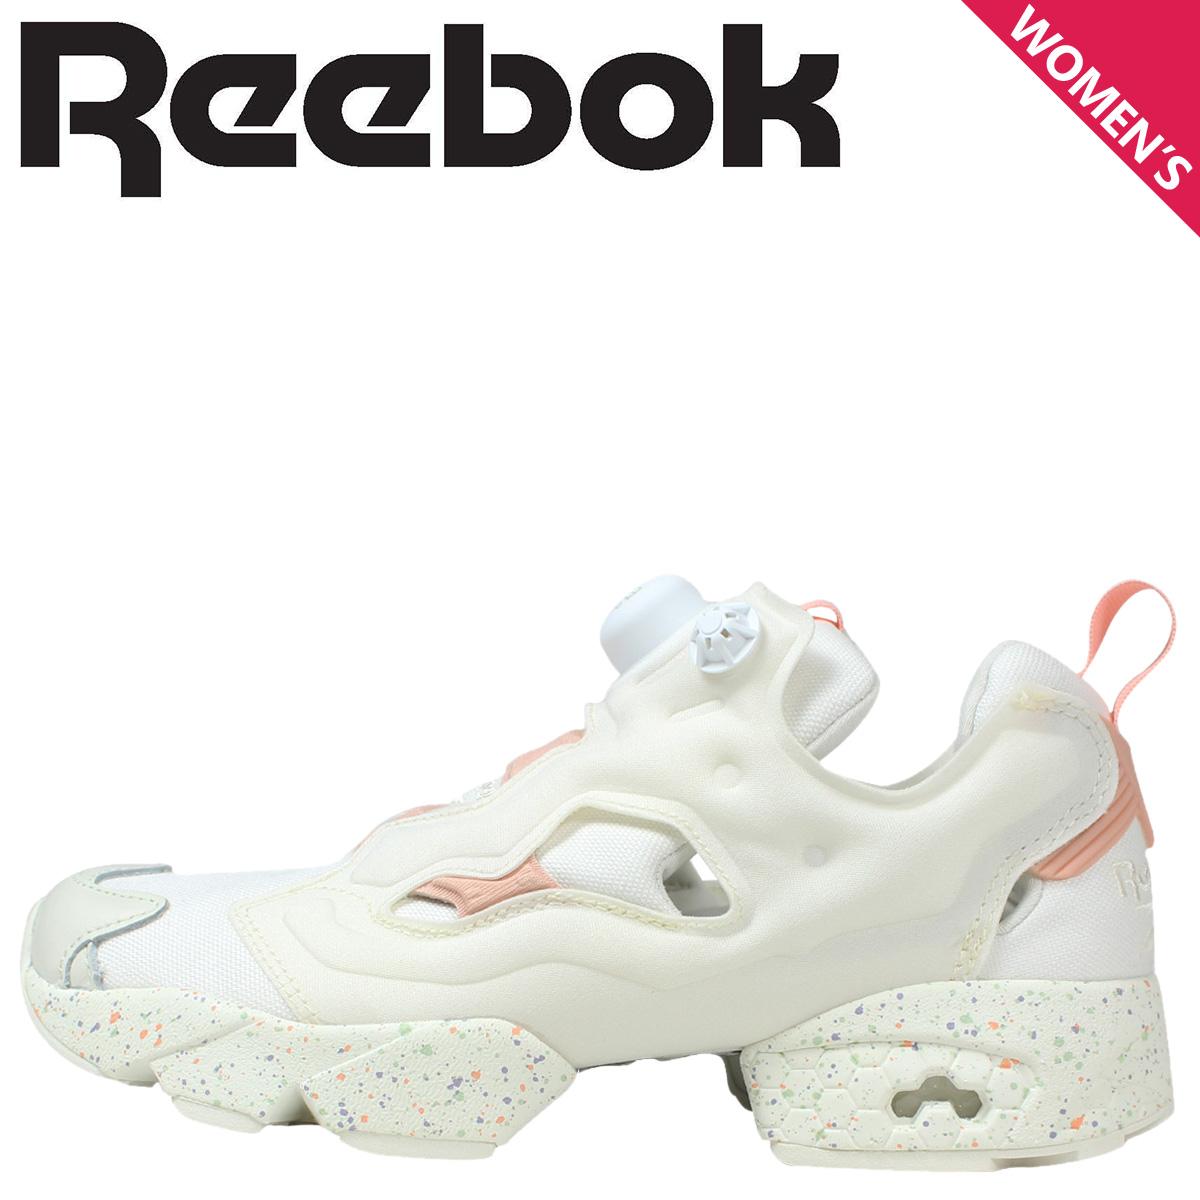 1f4984e01d89 Reebok Reebok pump fury cerebrate sneakers Womens INSTAPUMP FURY CELEBRATE  V69801 shoes white  ☆ 10.